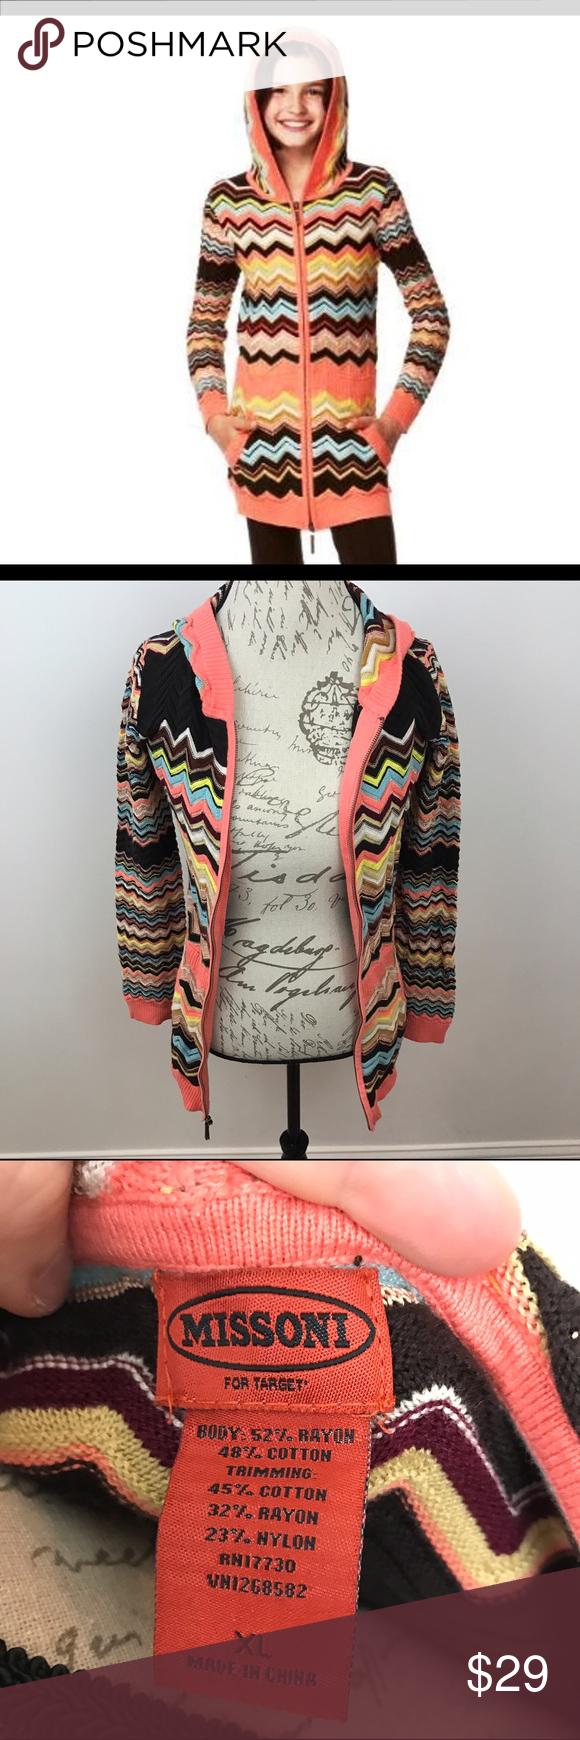 Missoni Target Girl's Full Zip Hooded Sweater XL | Hooded sweater ...